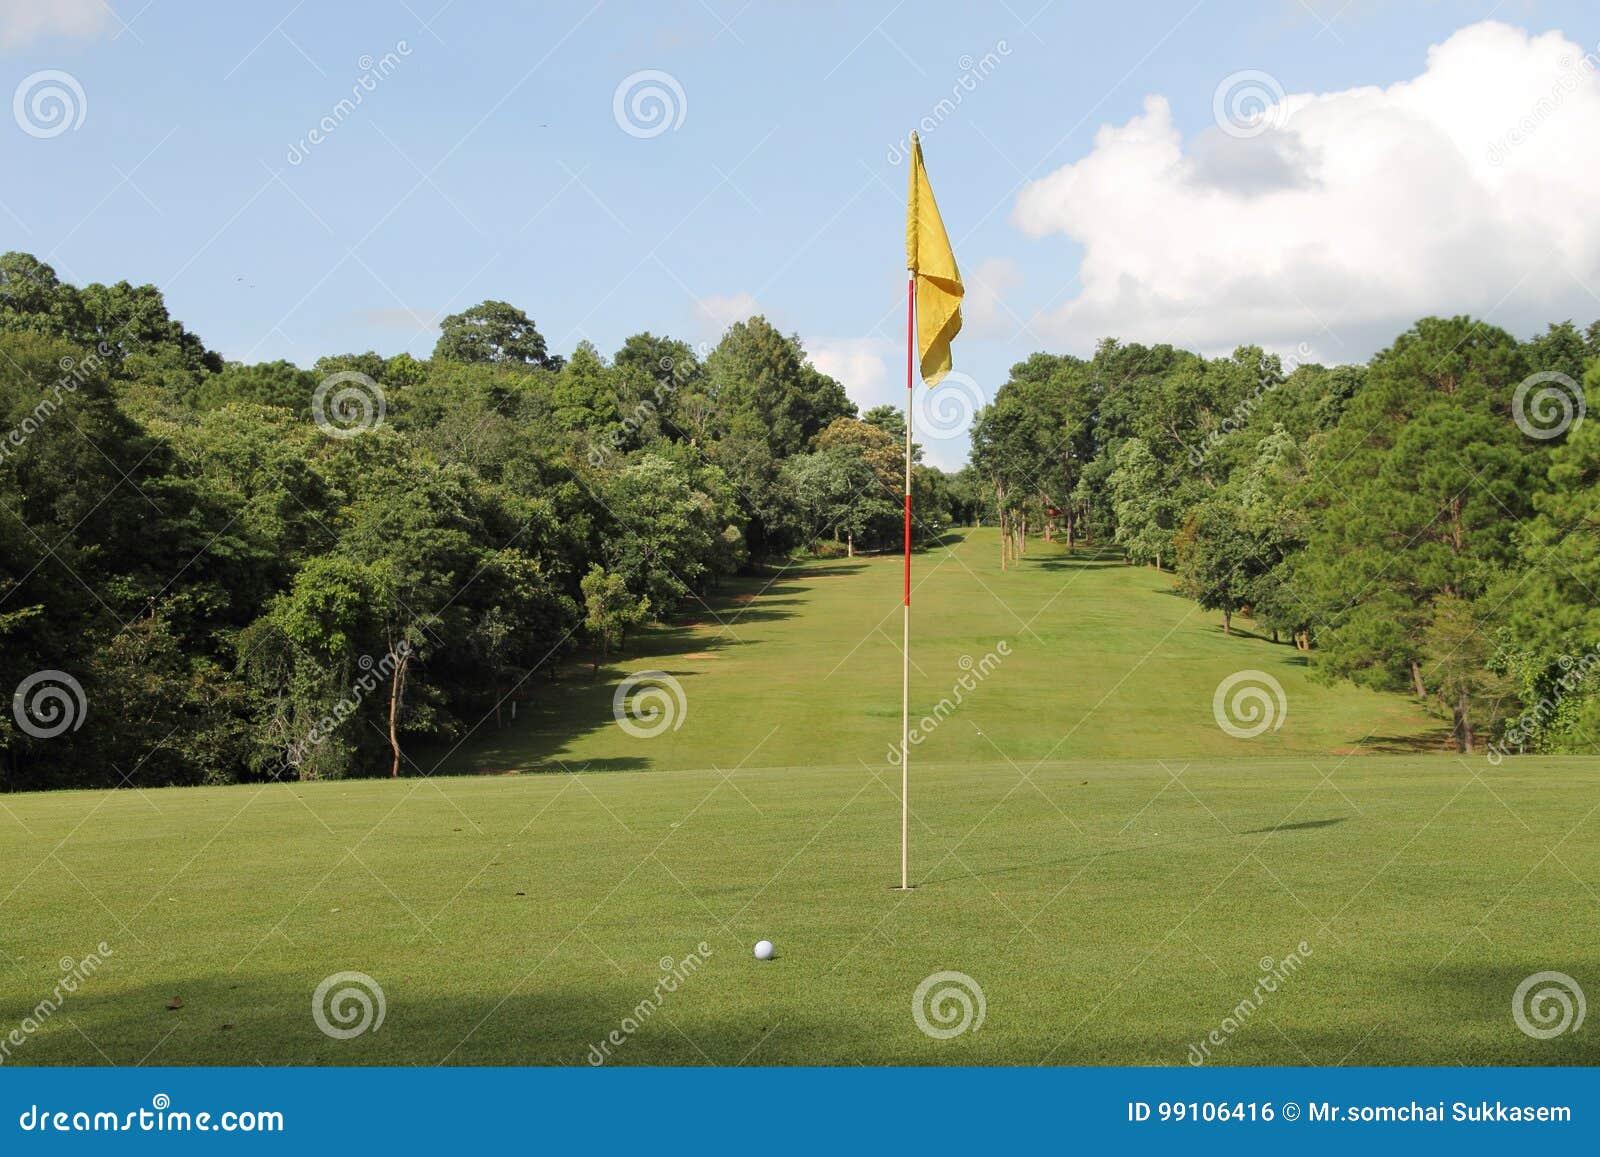 Golf balls in golf course